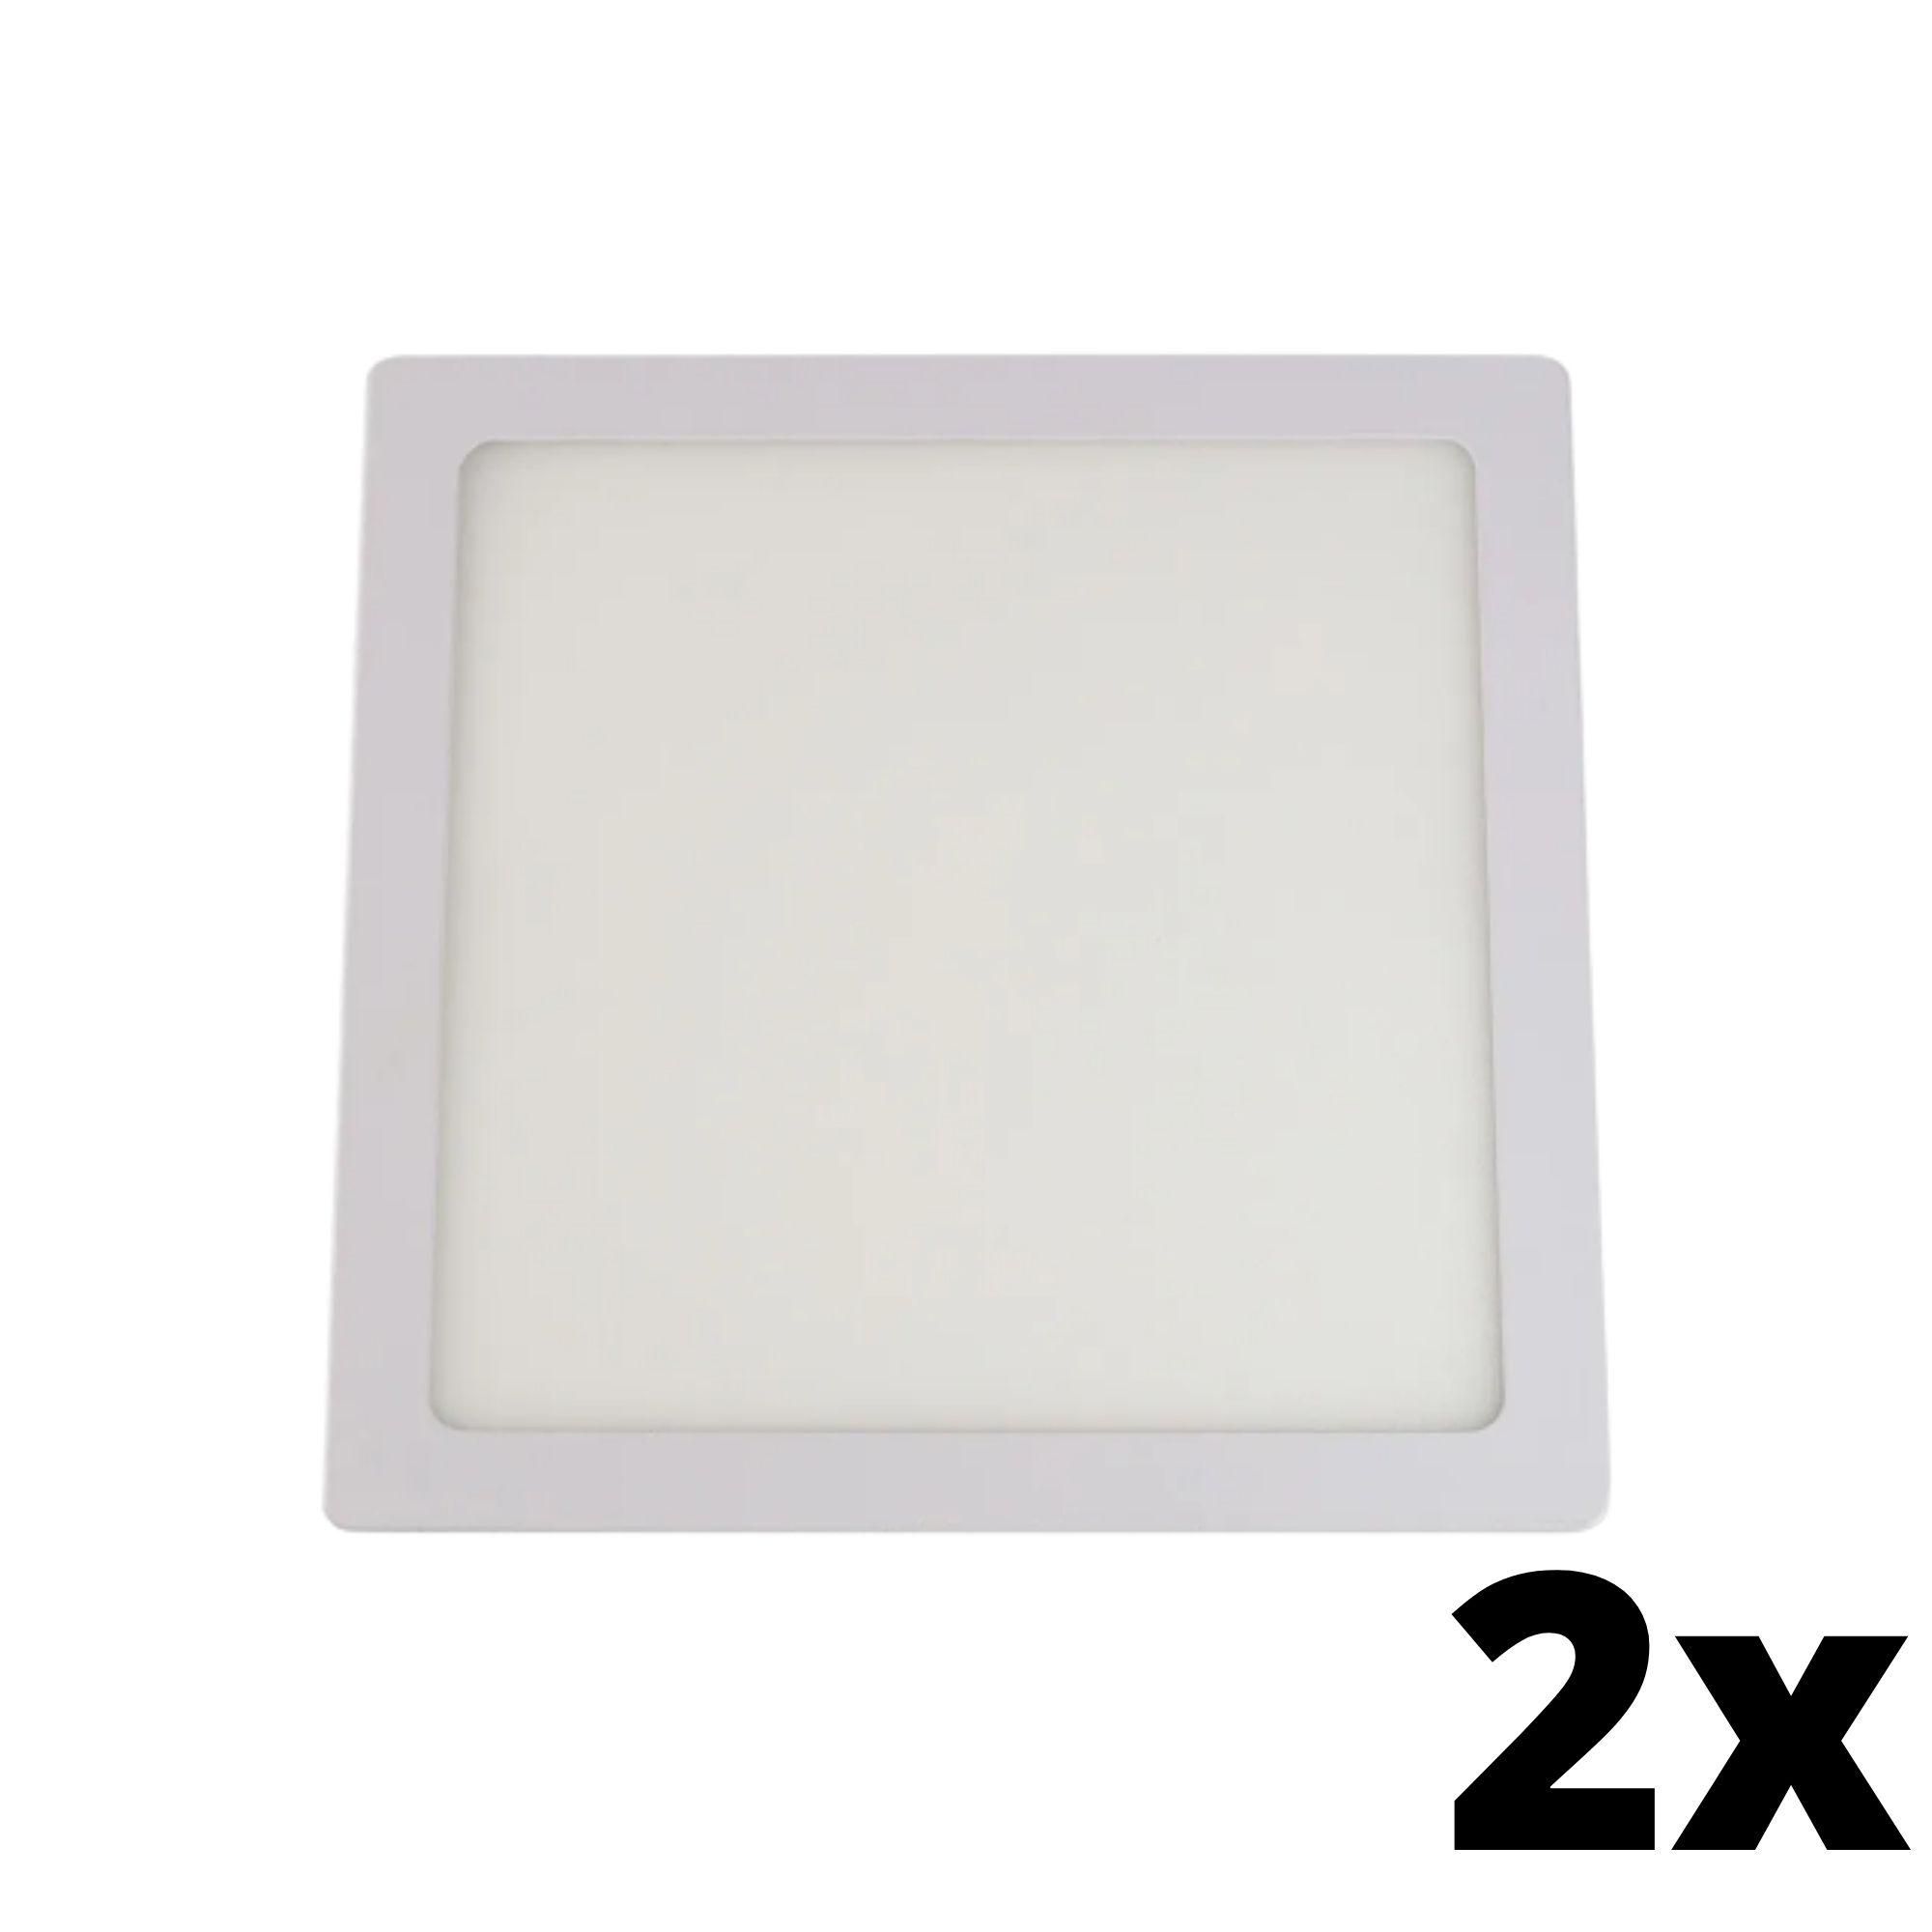 Kit 2 und Painel de Led Embutir 24w Quadrado 3000k